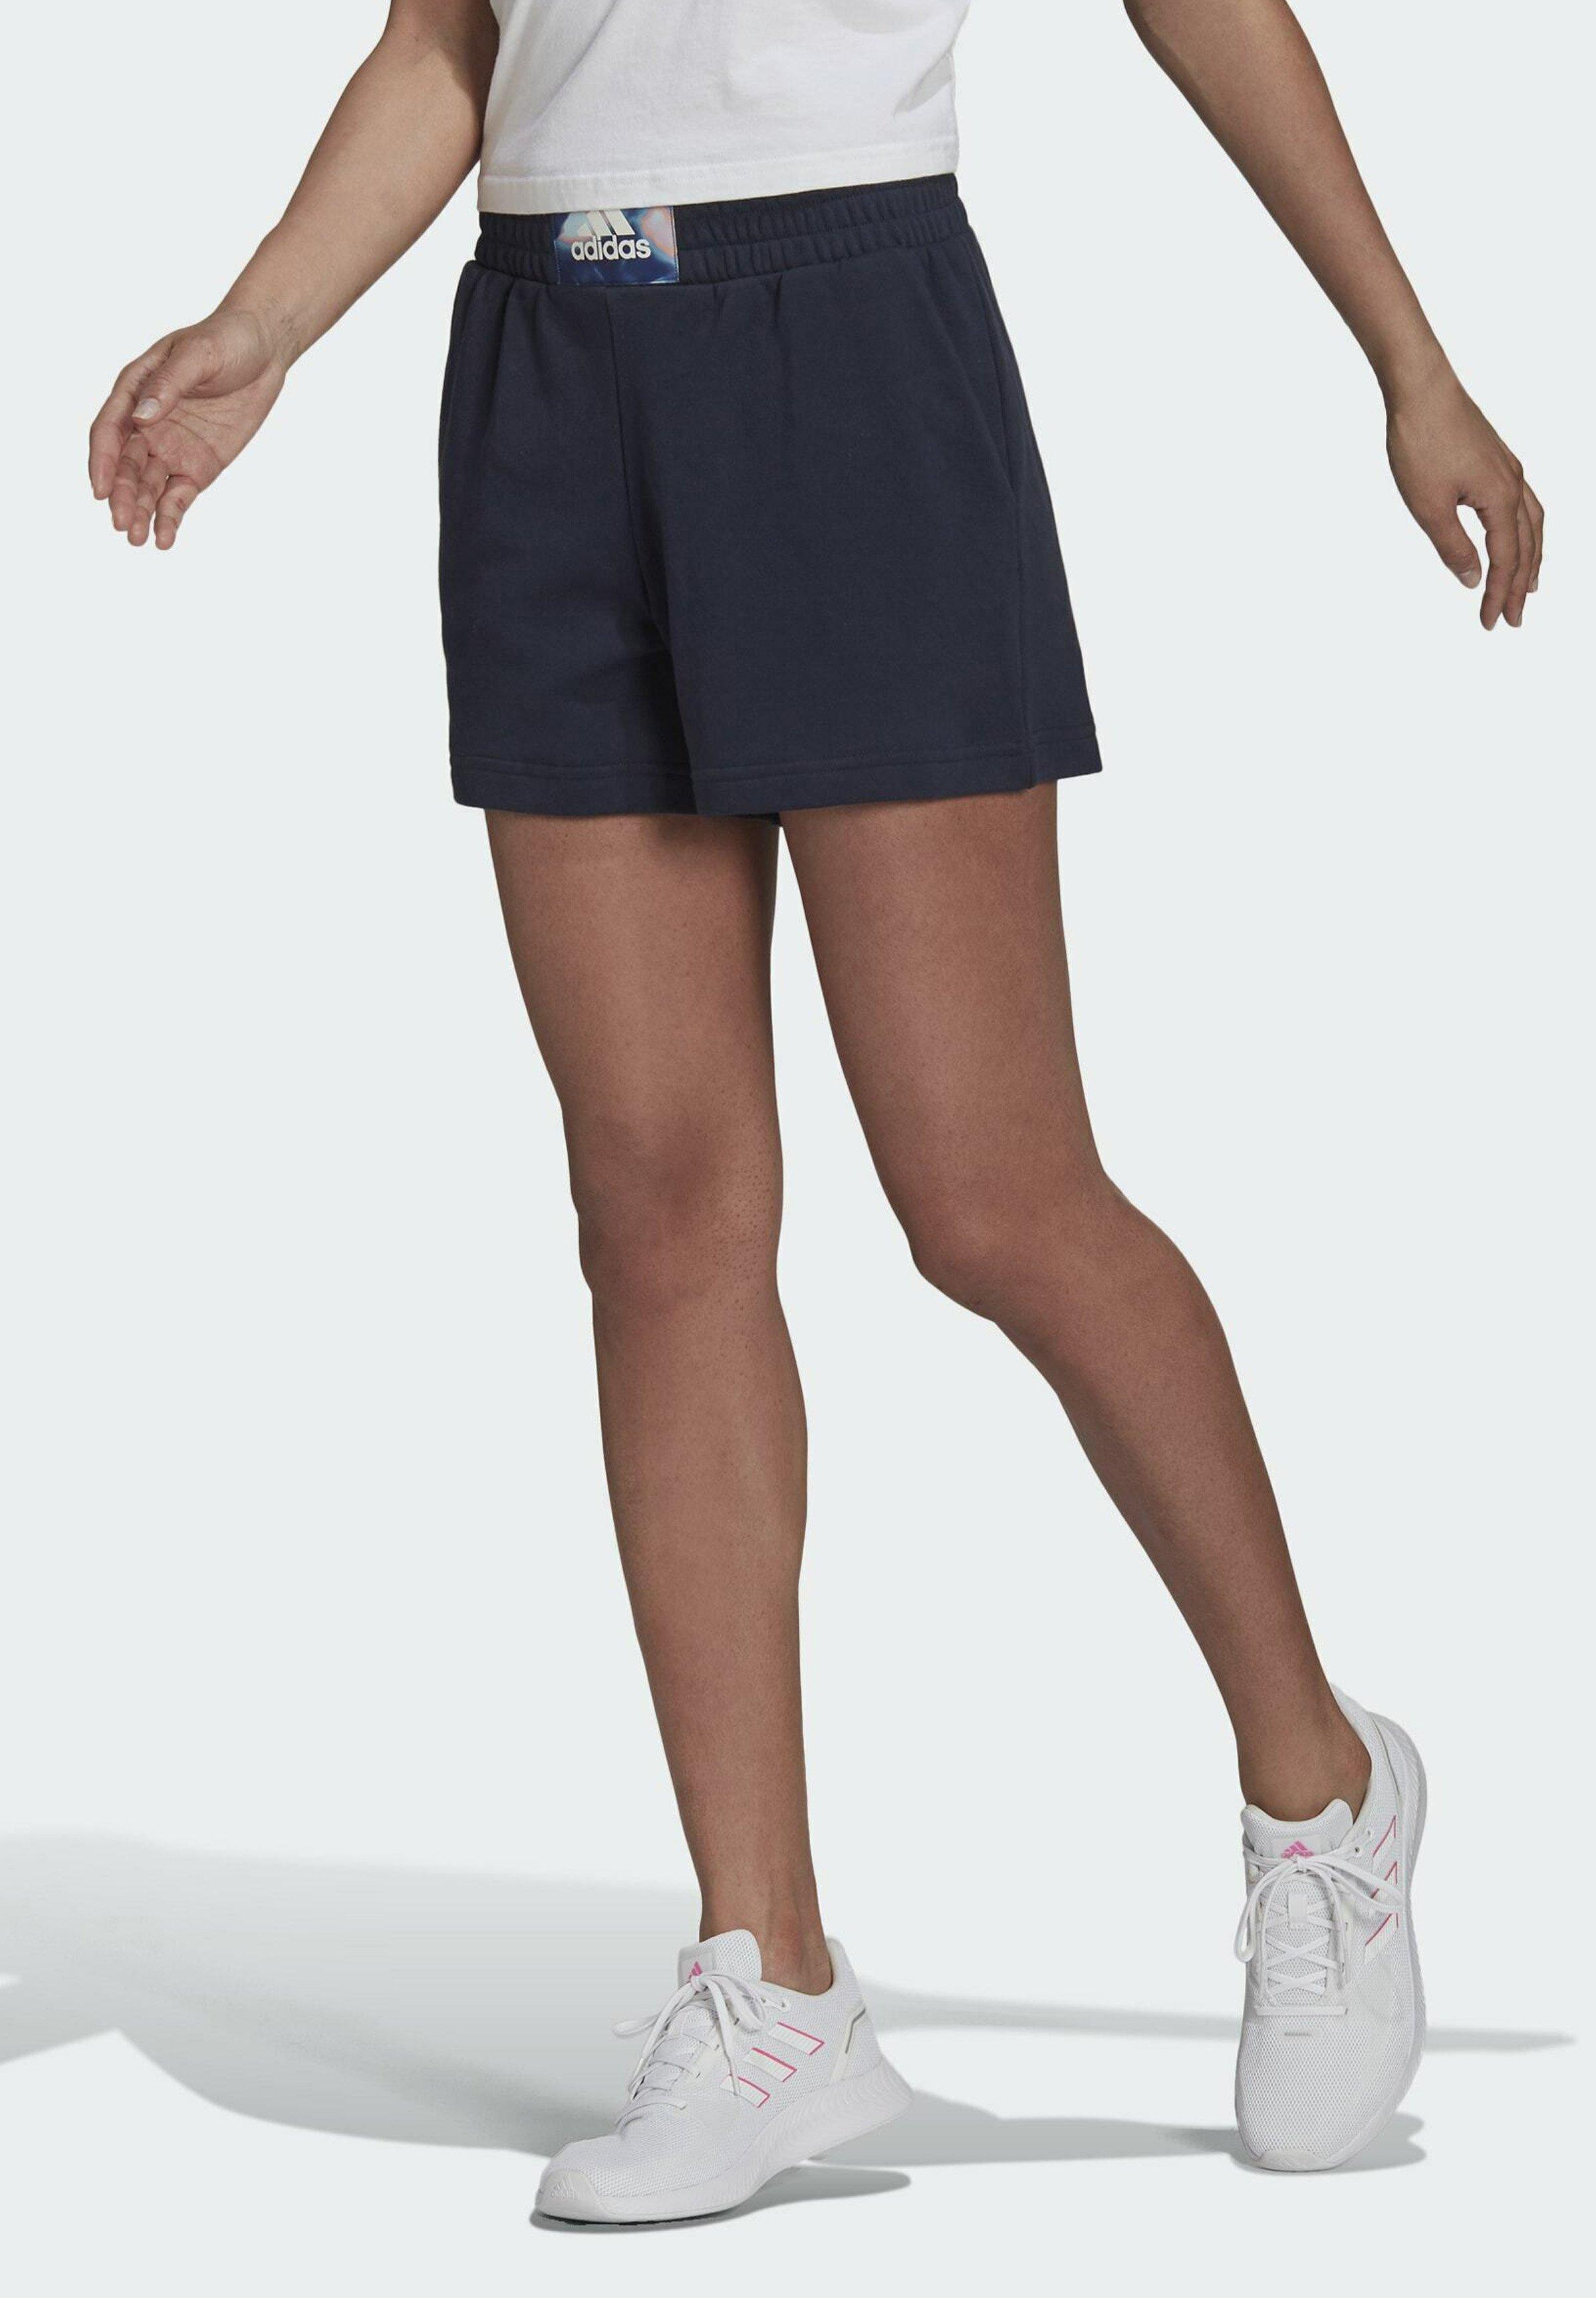 Donna W UFORU SHO - Pantaloncini sportivi